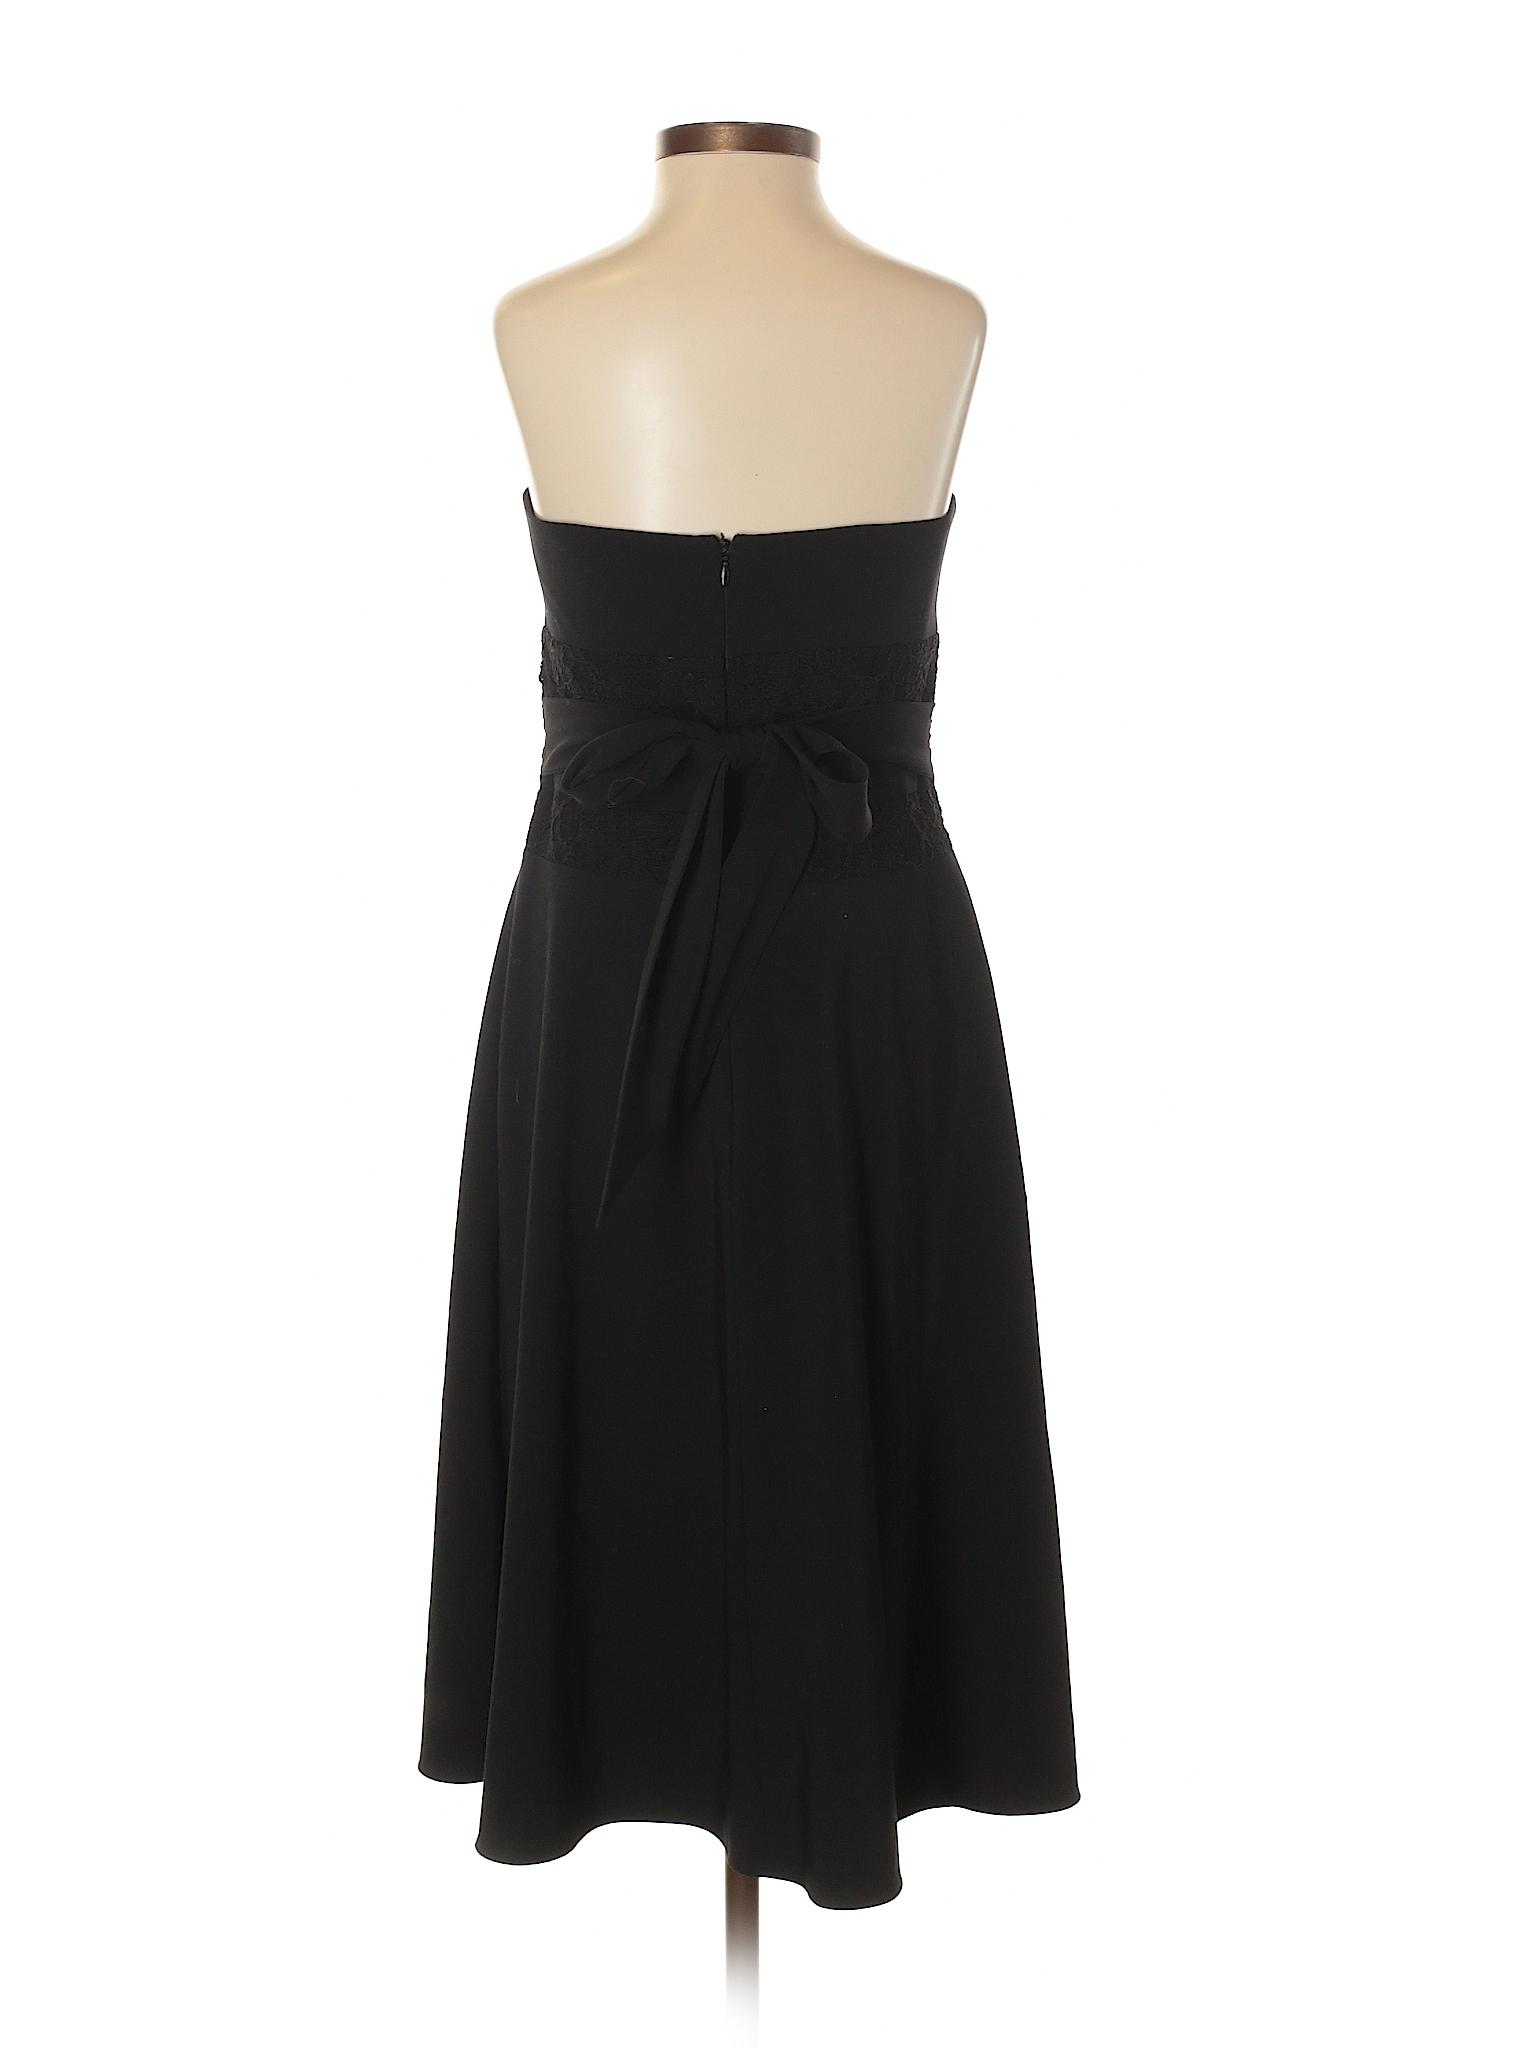 Dress White Casual Black Selling Market House 0Wx6n6